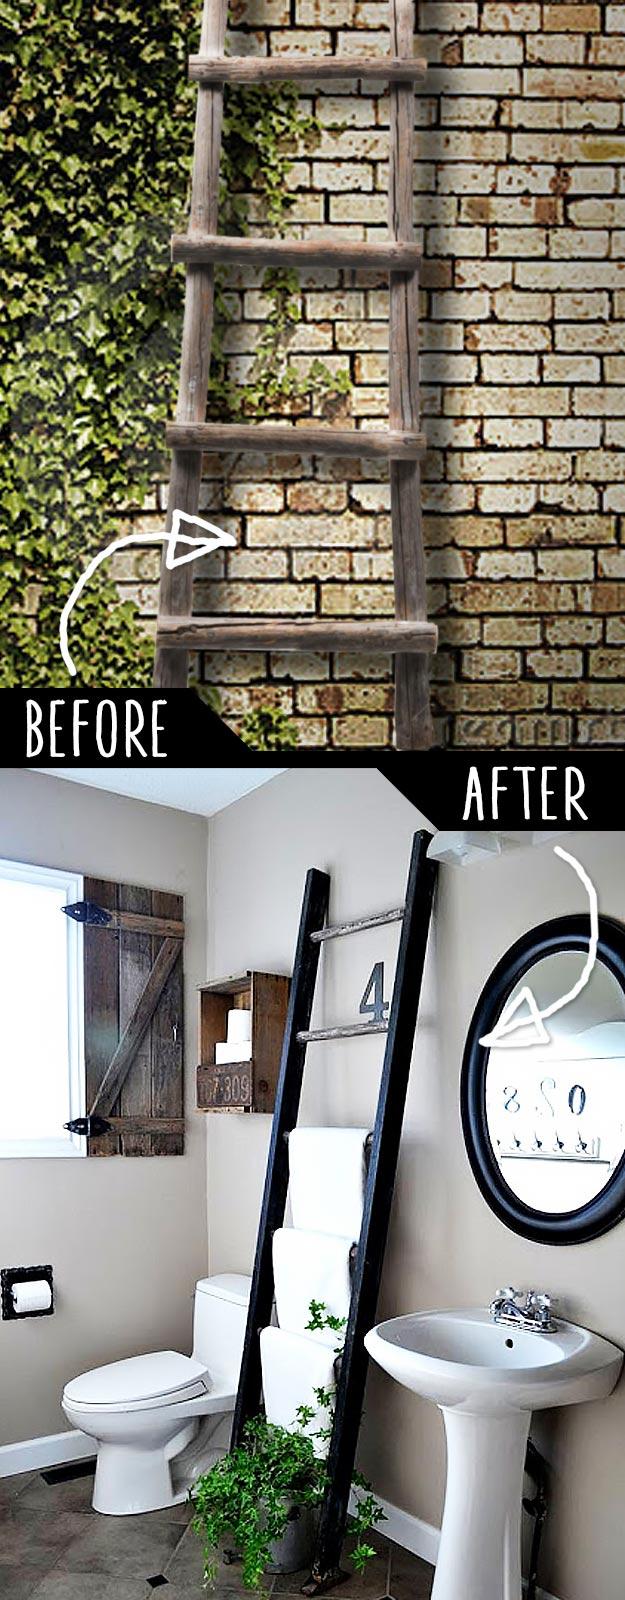 DIY Furniture Hacks   Ladder Towel Rack   Cool Ideas for Creative Do It Yourself Furniture   Cheap Home Decor Ideas for Bedroom, Bathroom, Living Room, Kitchen #diy